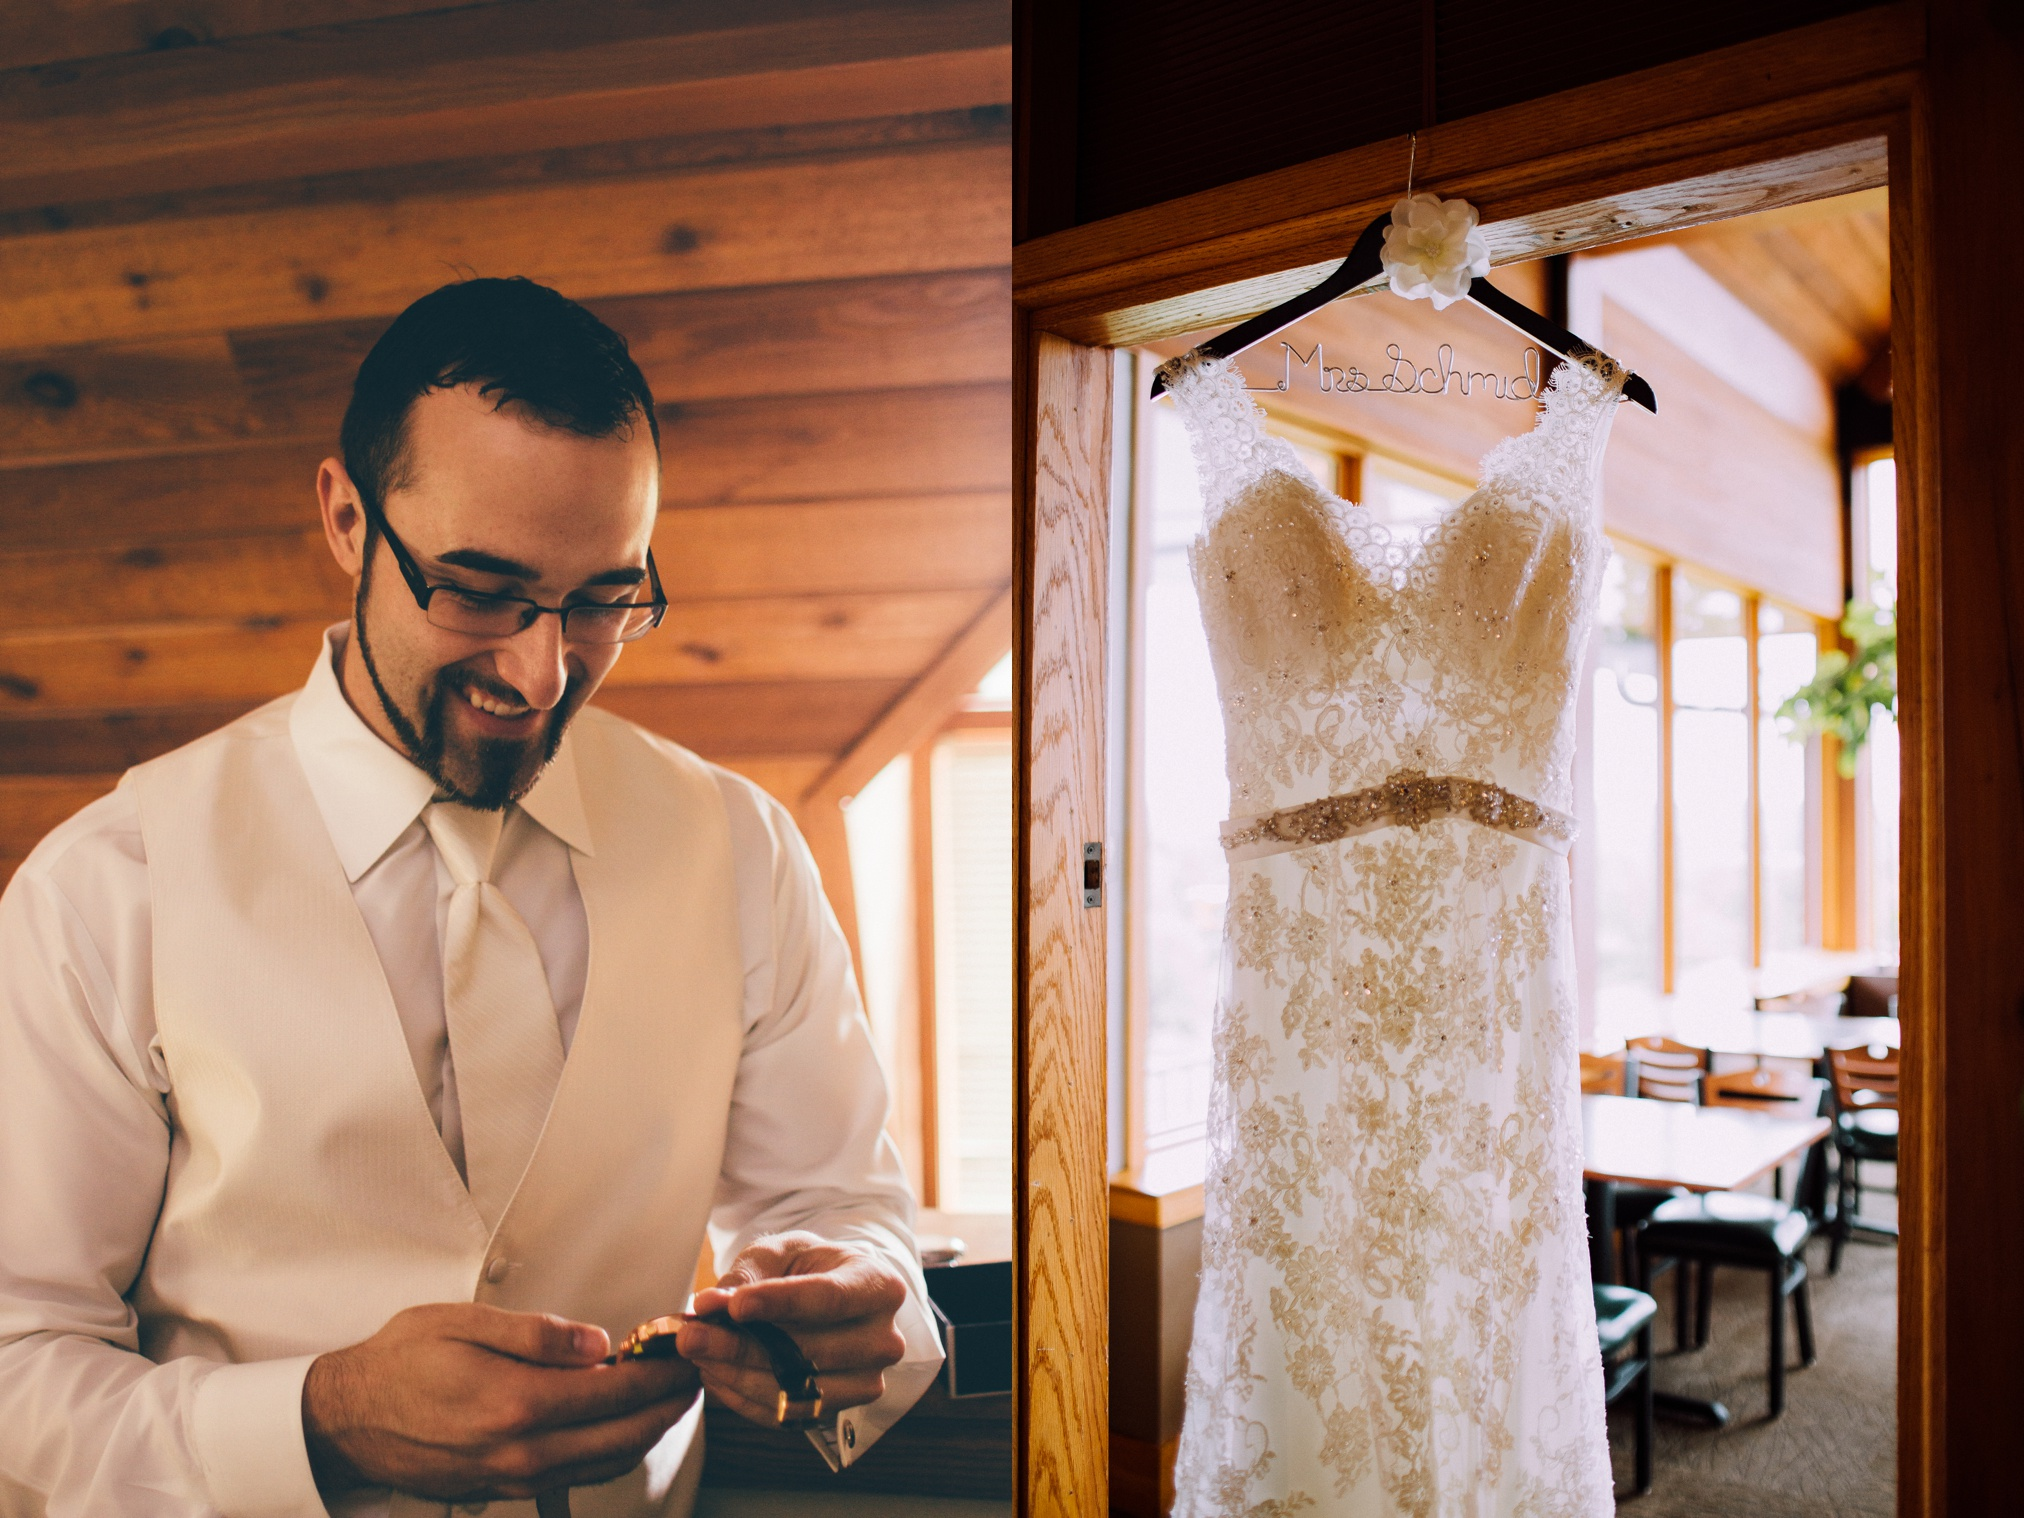 schmid_wedding-33.jpg